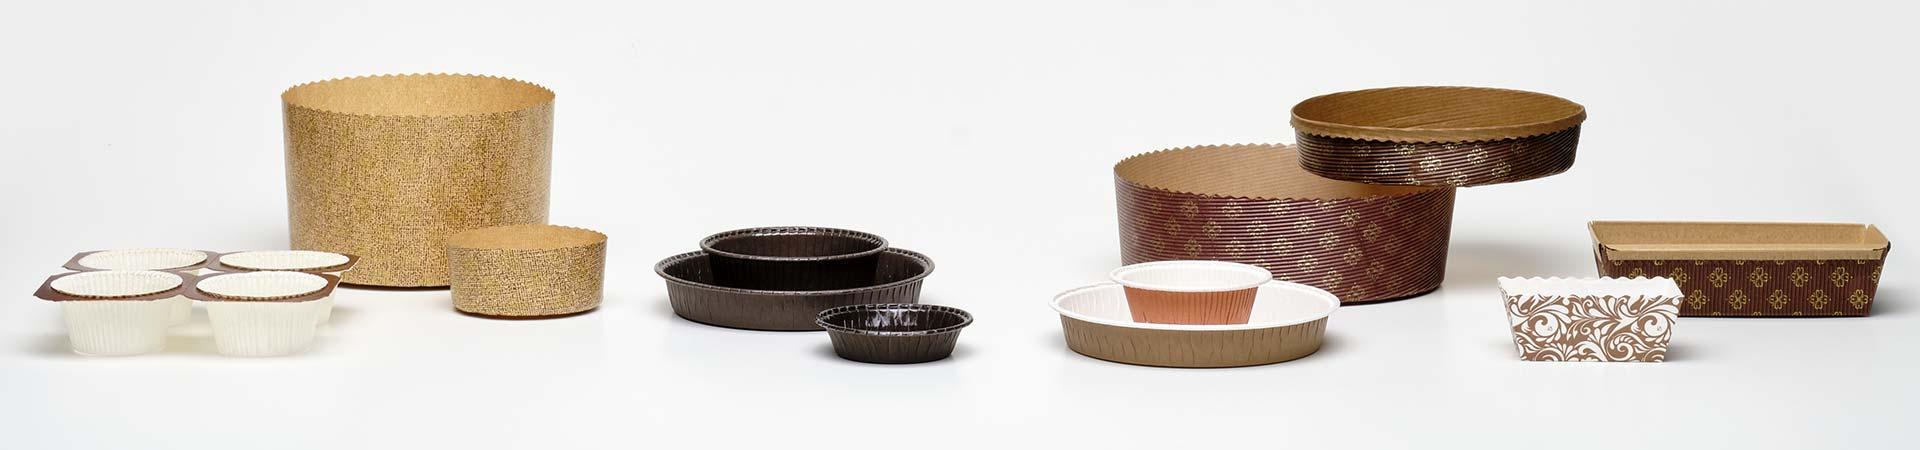 Paper Tech baking moulds for distributors